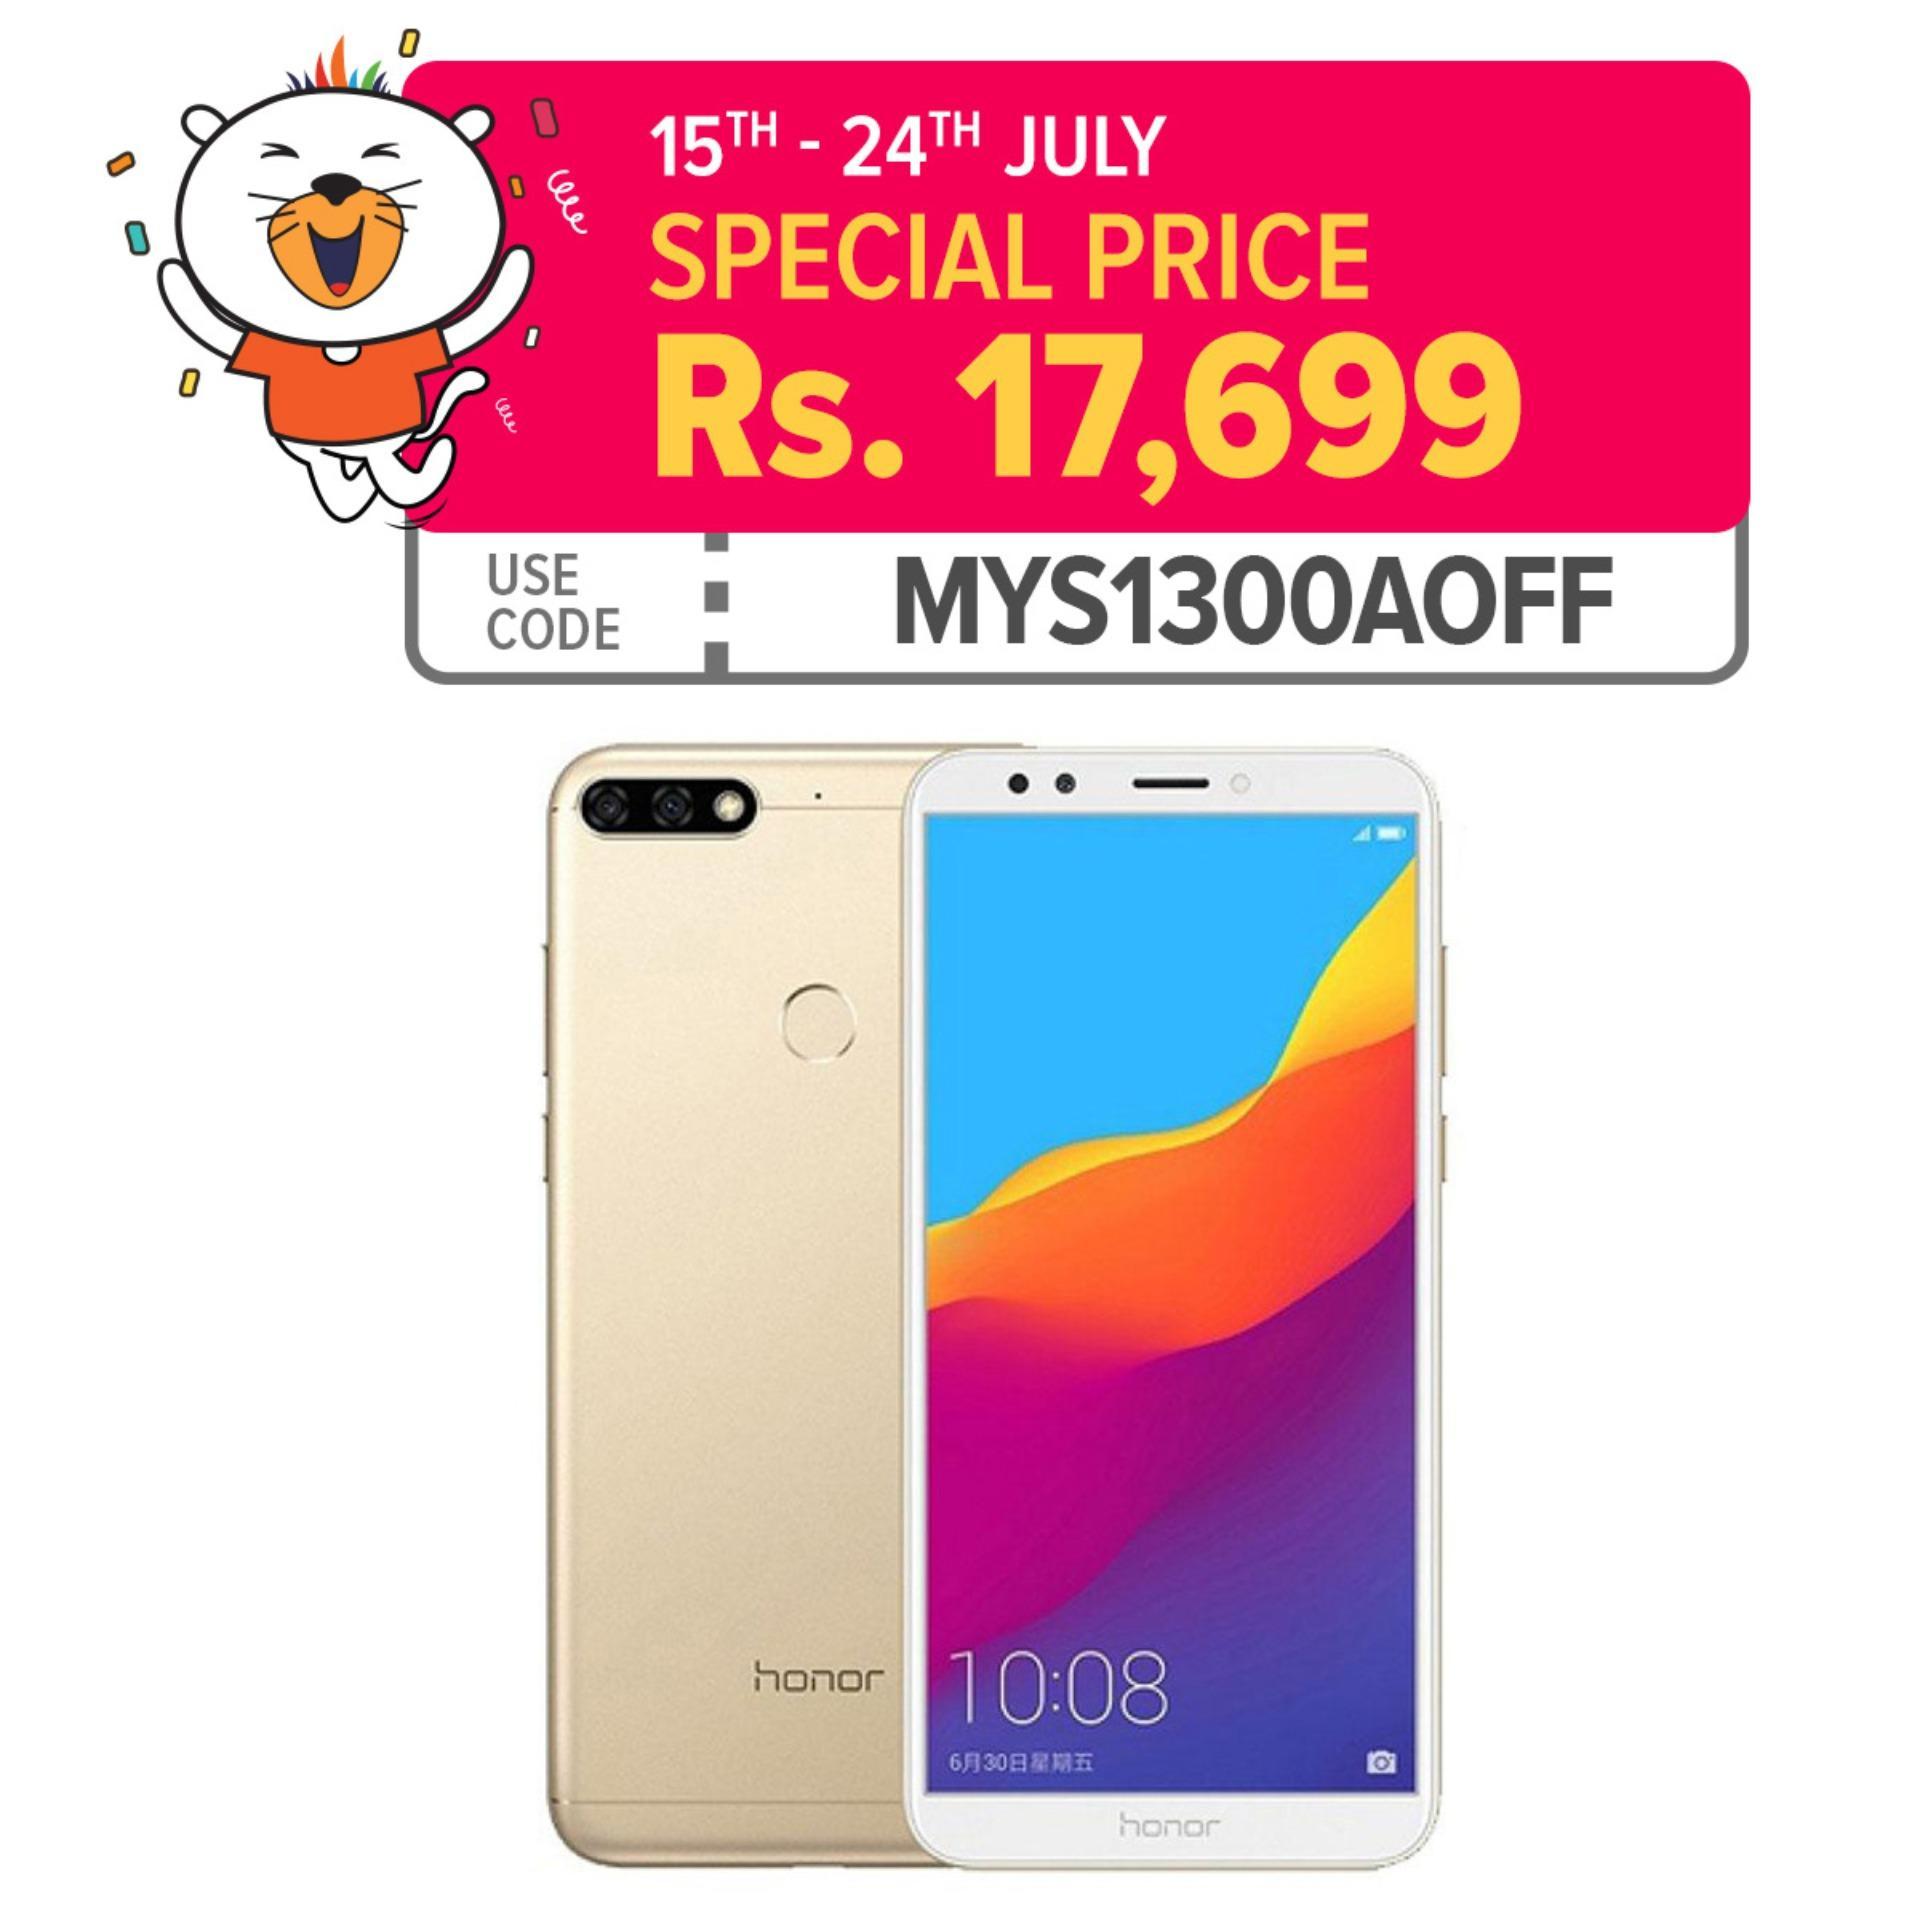 eafecf30ca95bc Mobile Price in Pakistan 2019 | Mobile Phones on Installments - Daraz.pk